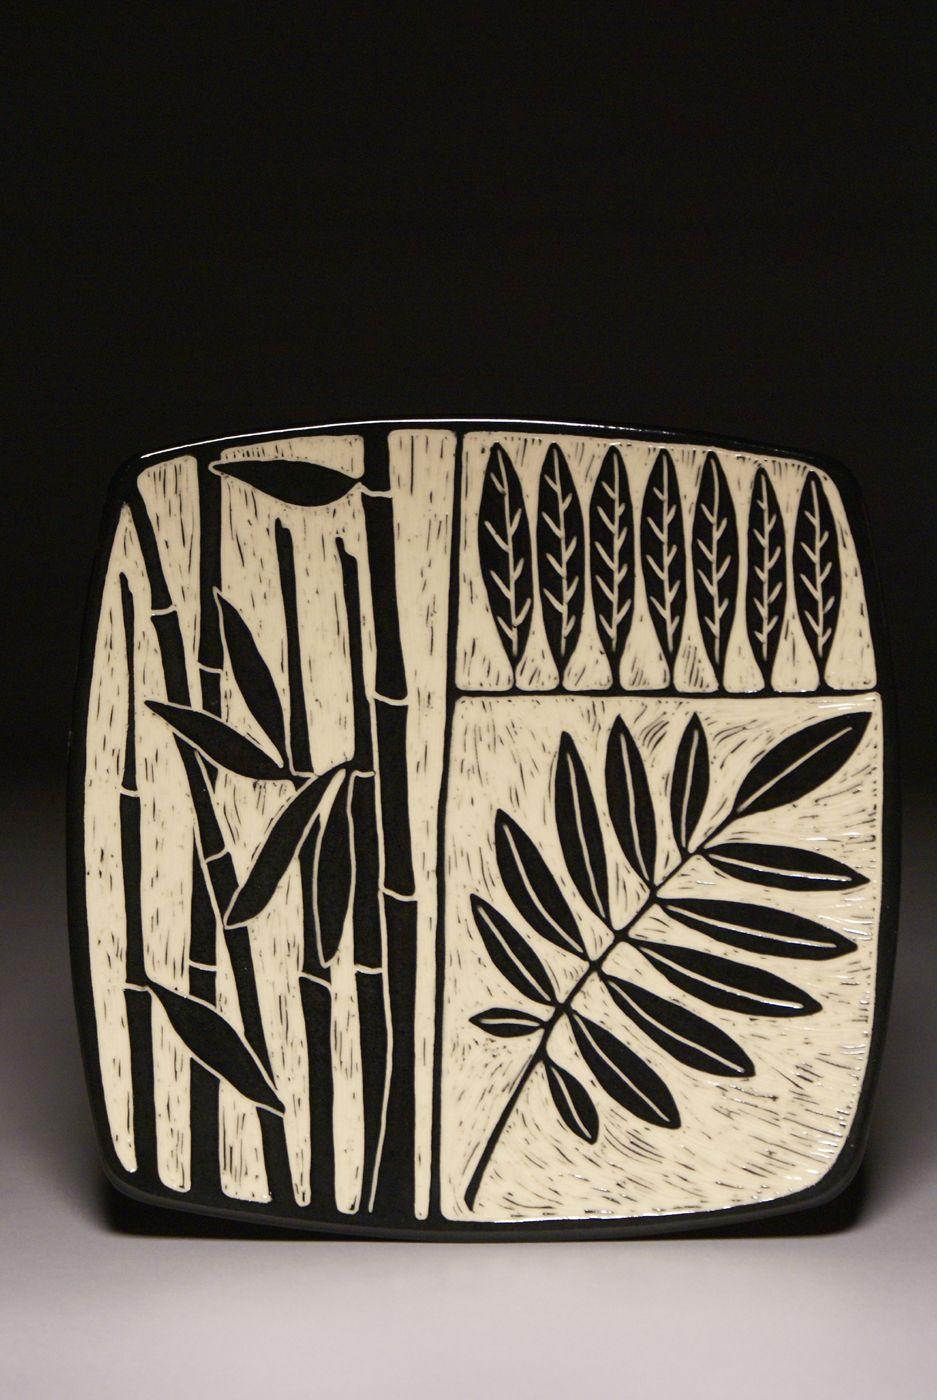 White ceramic plates for crafts - Jennifer Falter Philadelphia Museum Of Art Craft Show